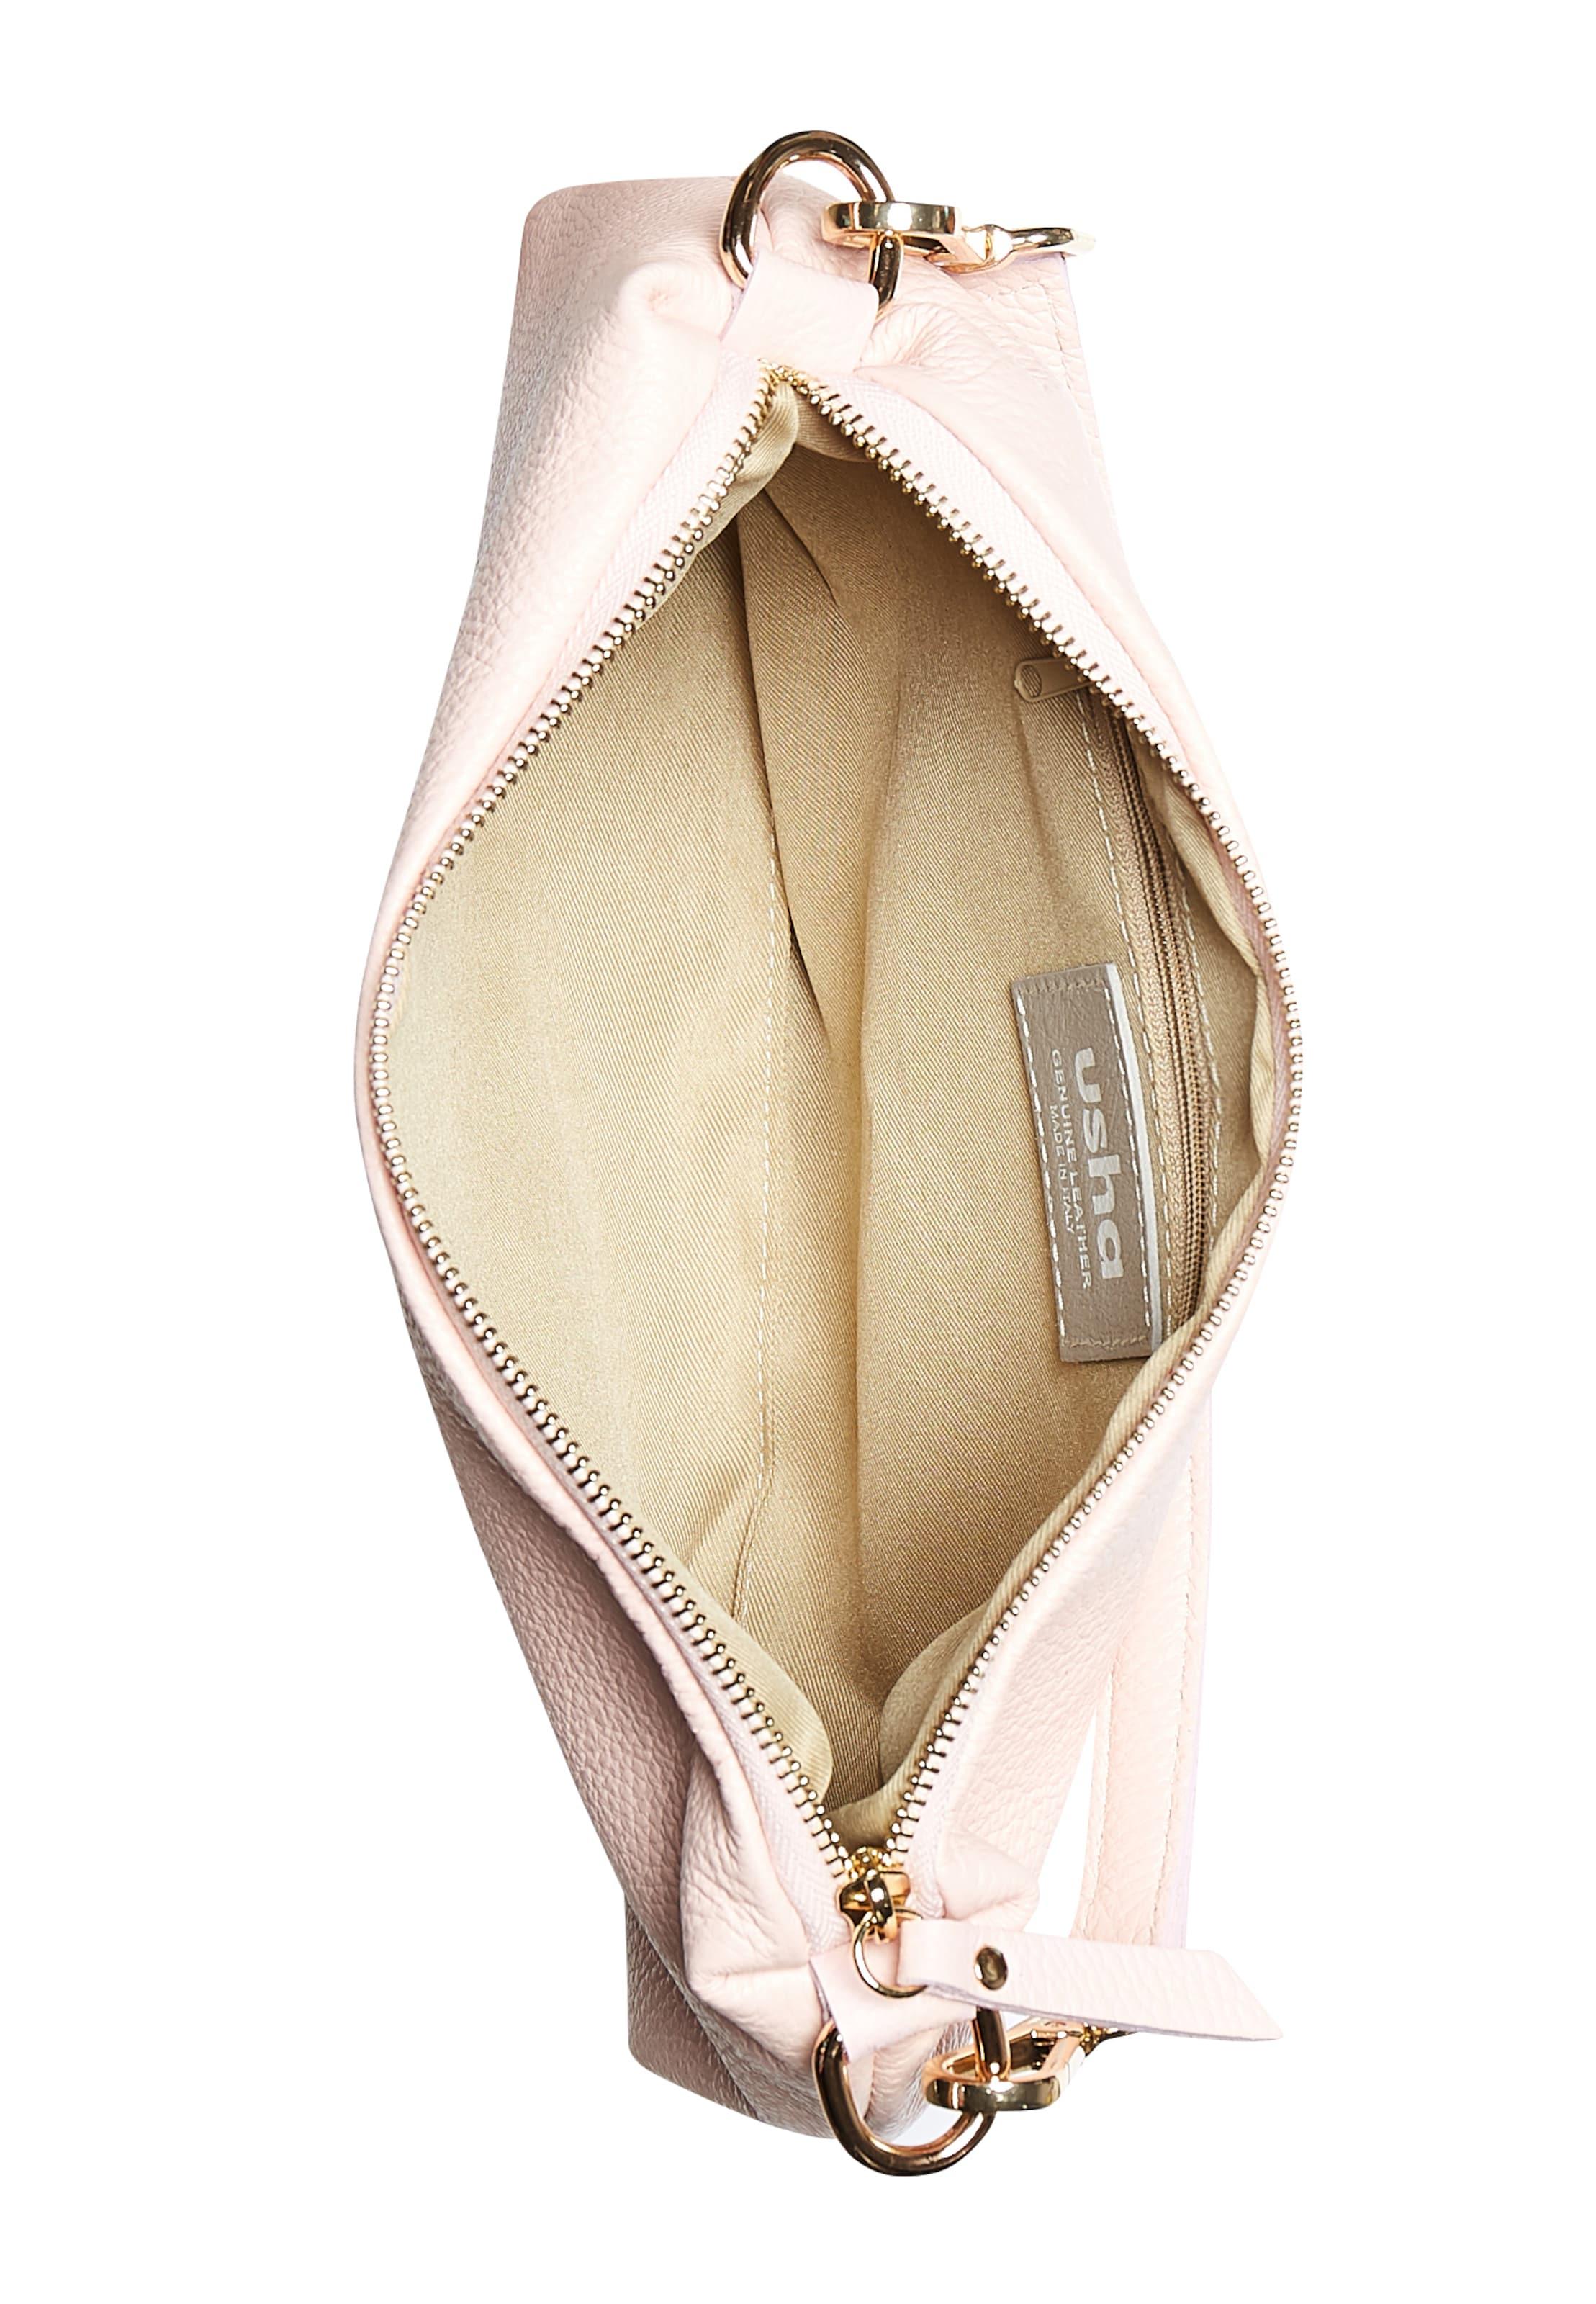 Rosa Rosa Usha Handtasche Handtasche Usha In Handtasche Handtasche Rosa In Usha Usha In QrtsCdxhB